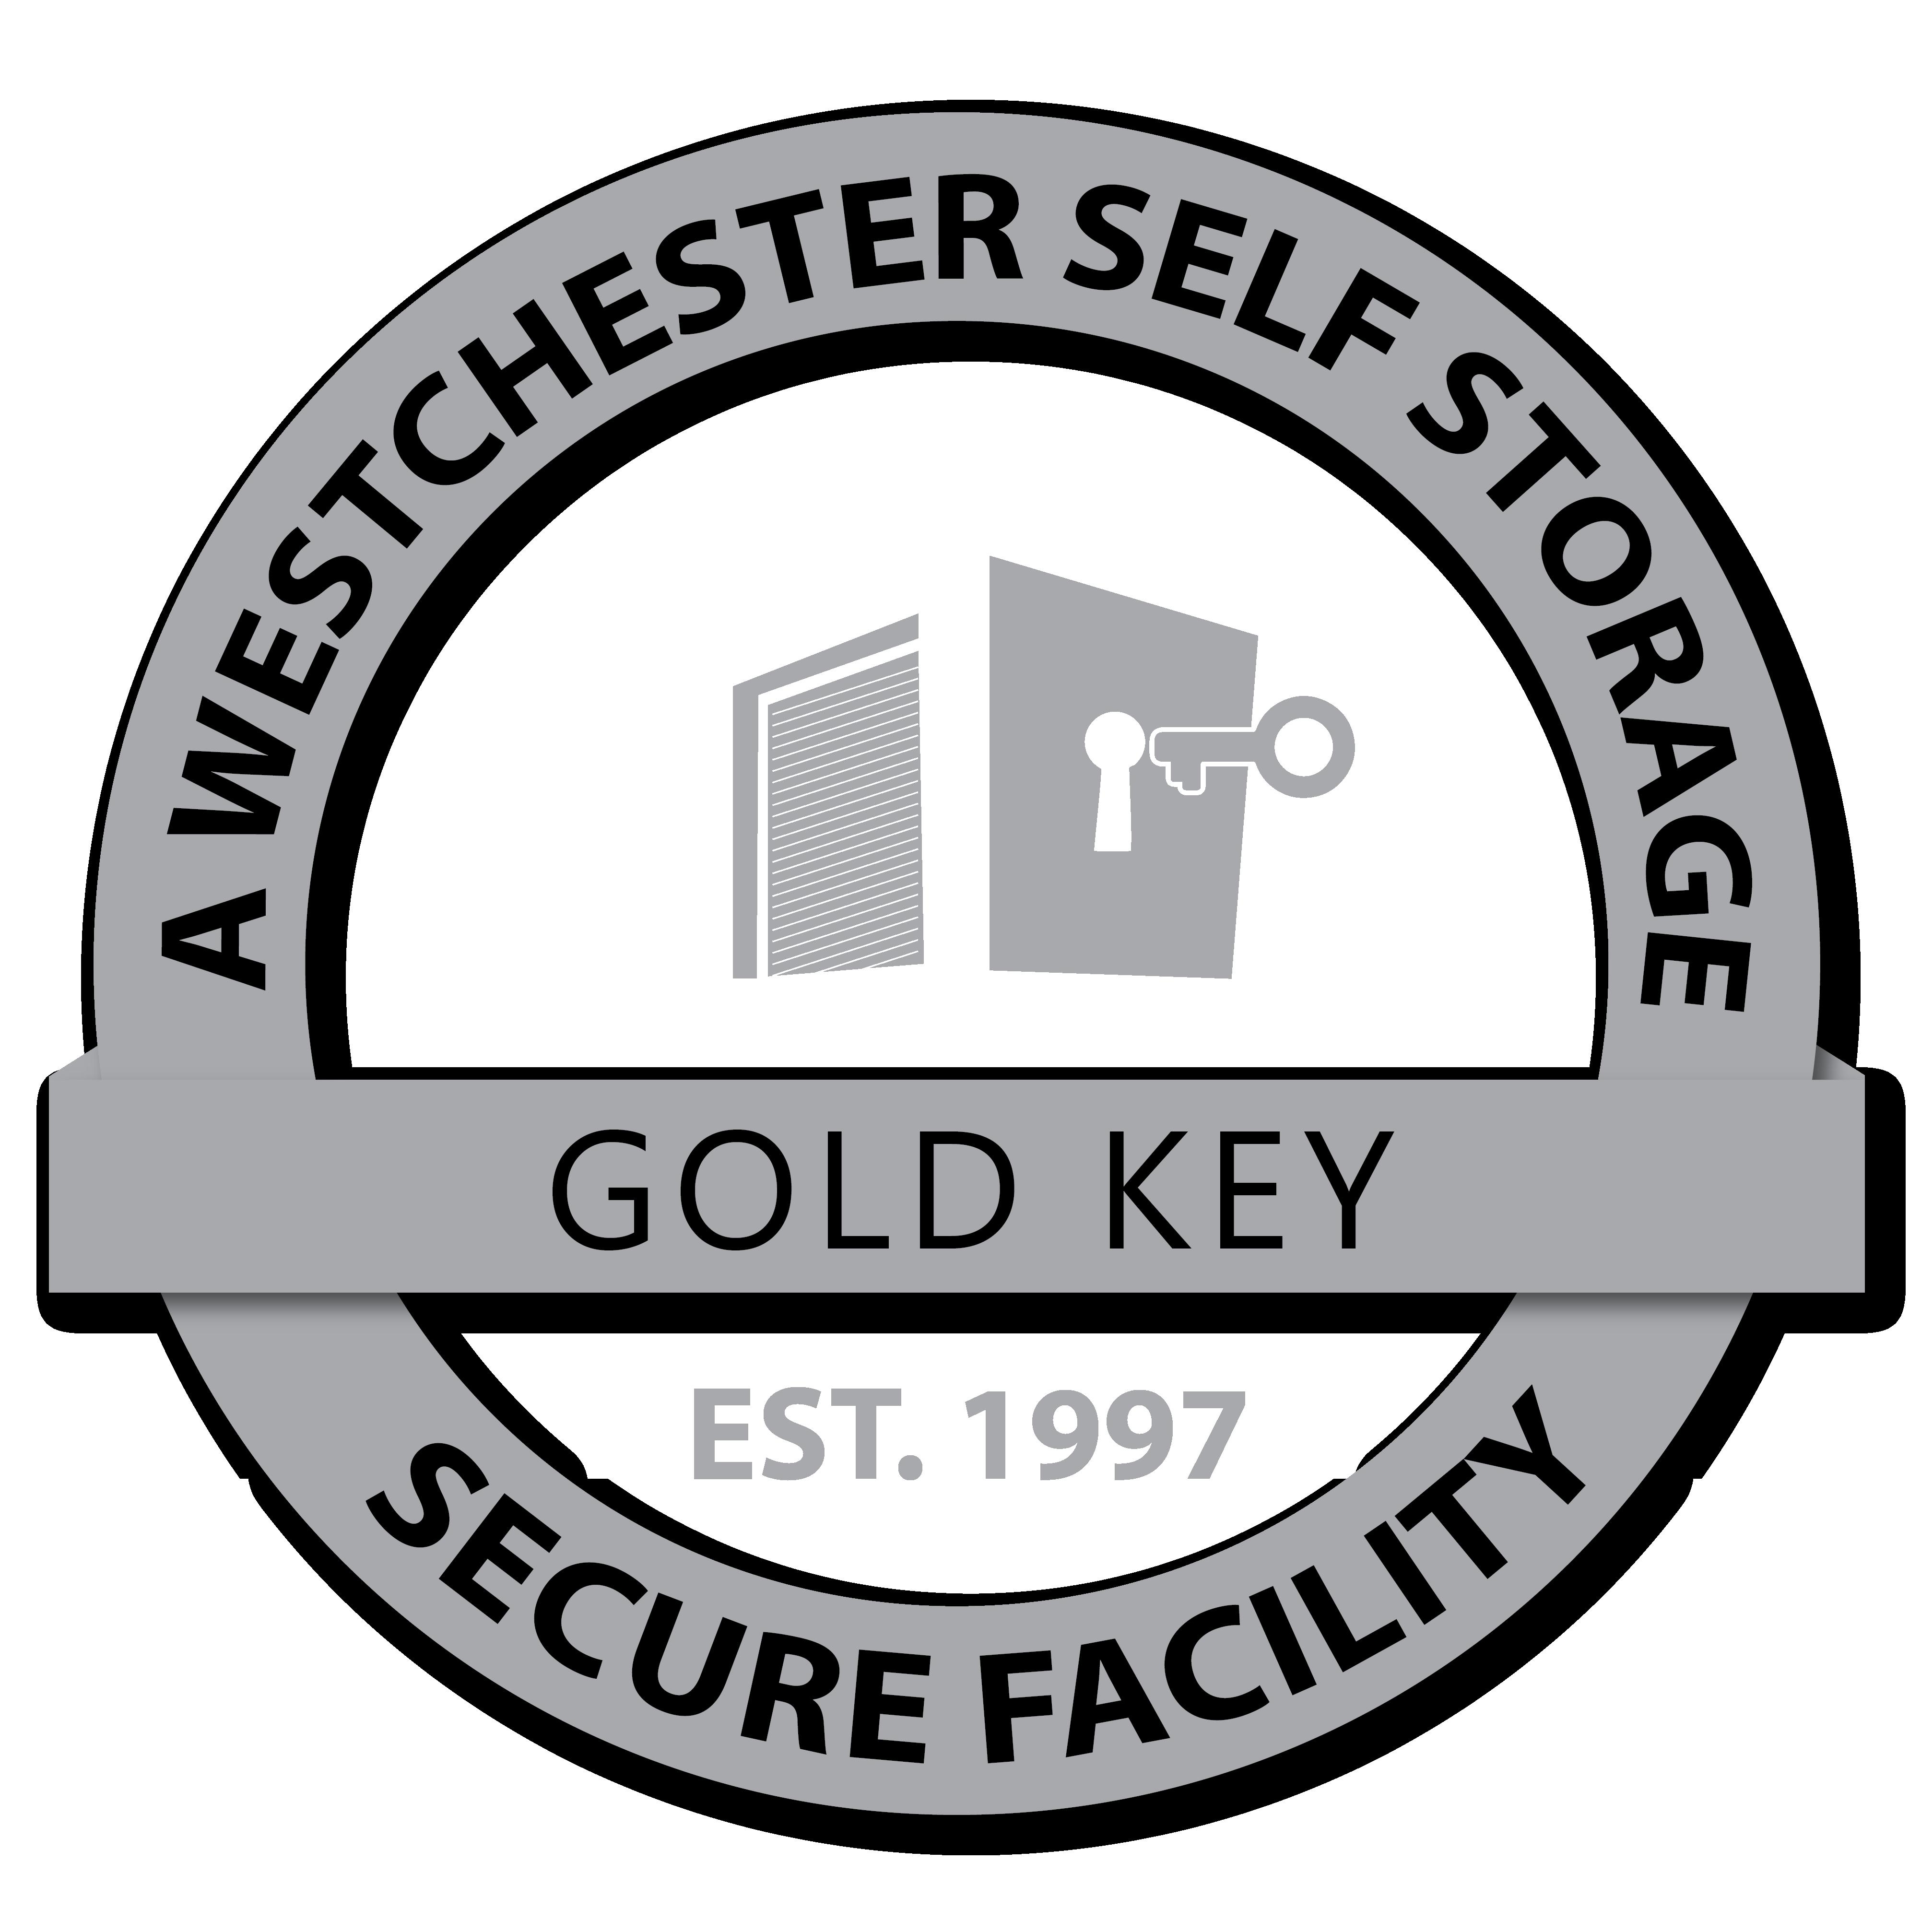 ABOUT US Westchester Self Storage Grey Logo